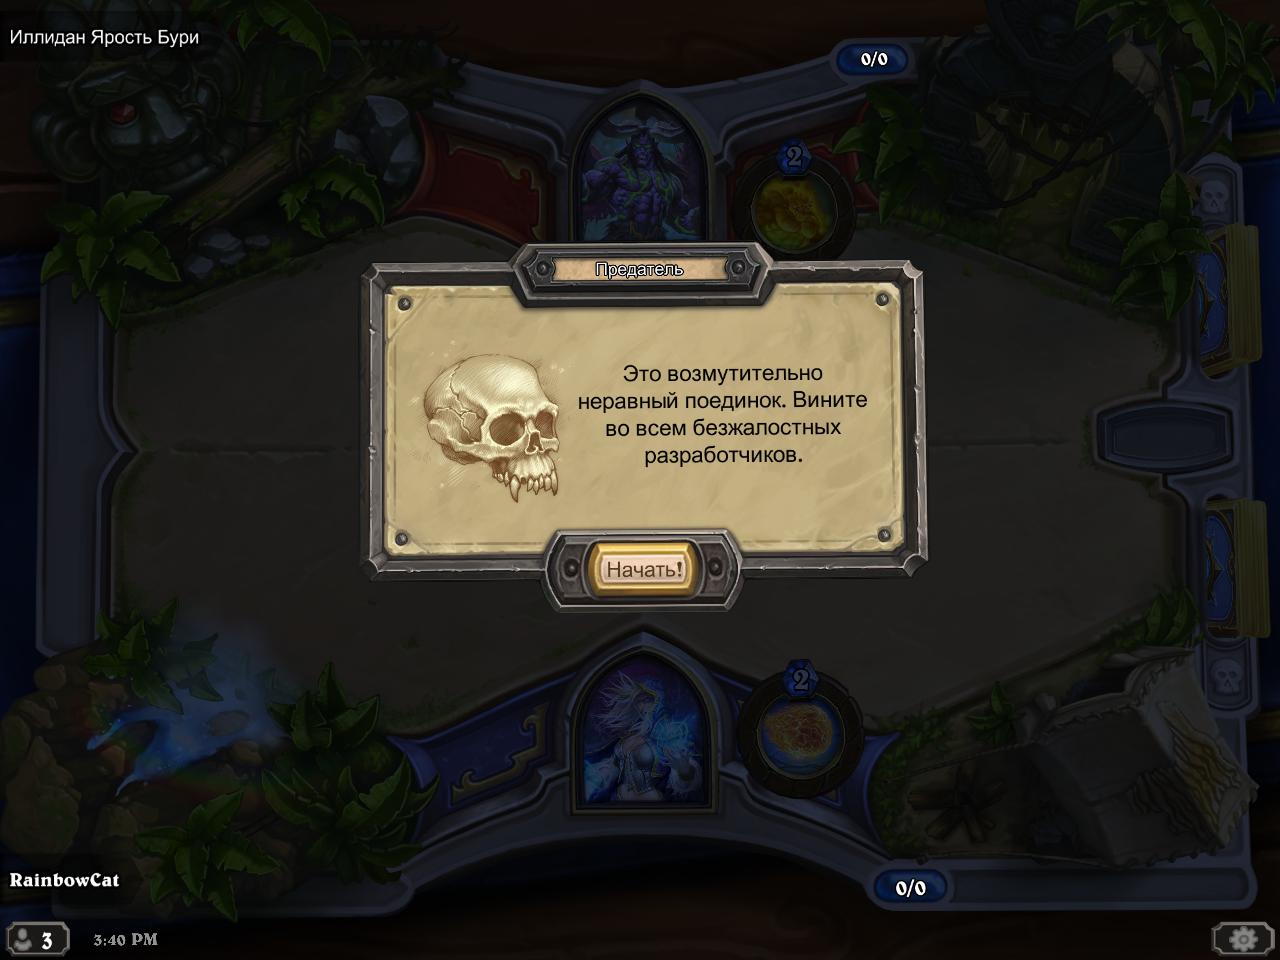 Вот беда(   #Warcraft #Hearthstone  - Изображение 1